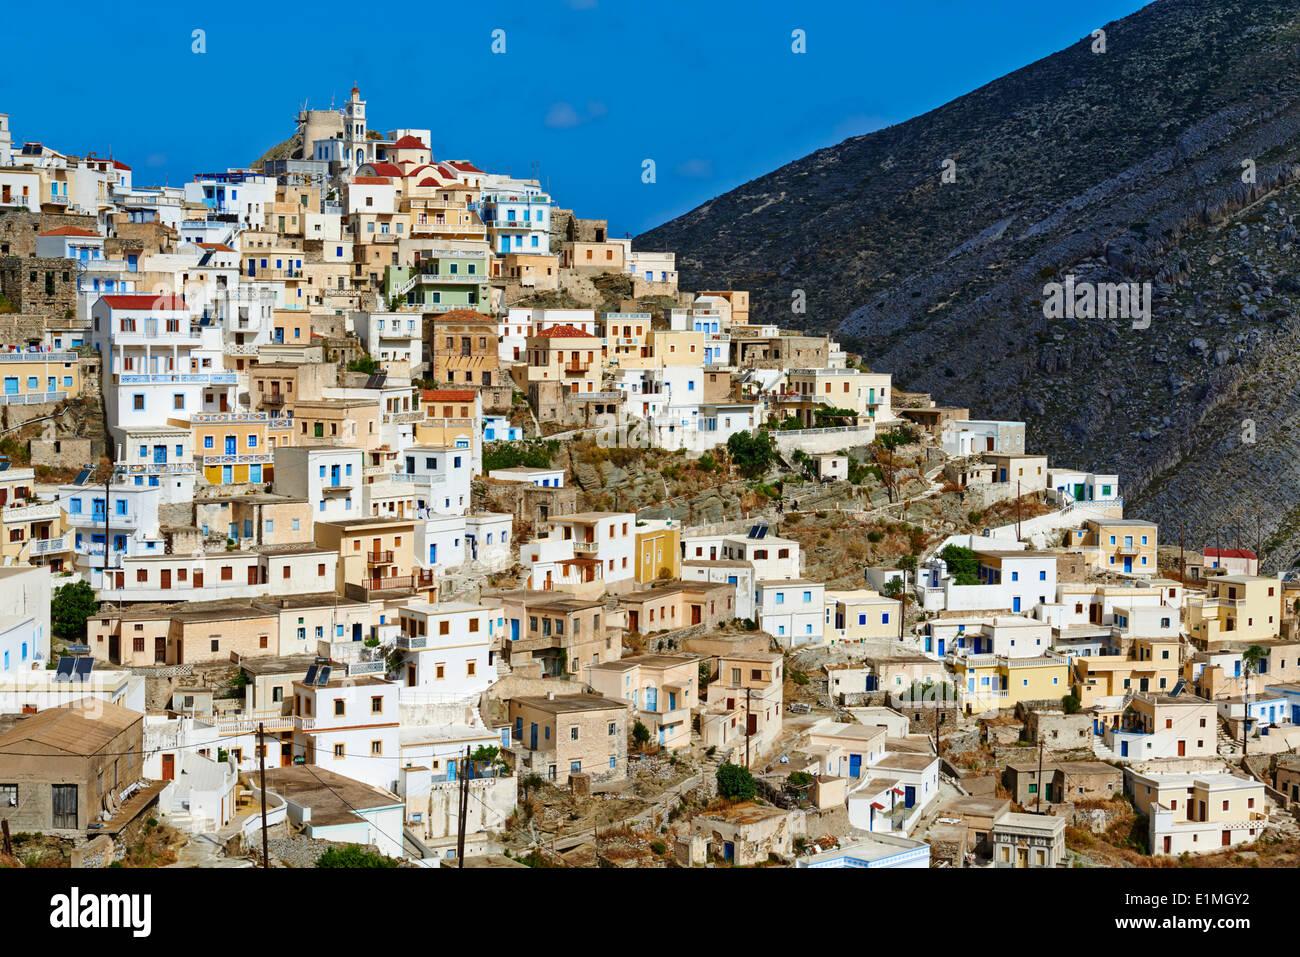 Greece, Dodecanese, Karpathos island, Olympos - Stock Image